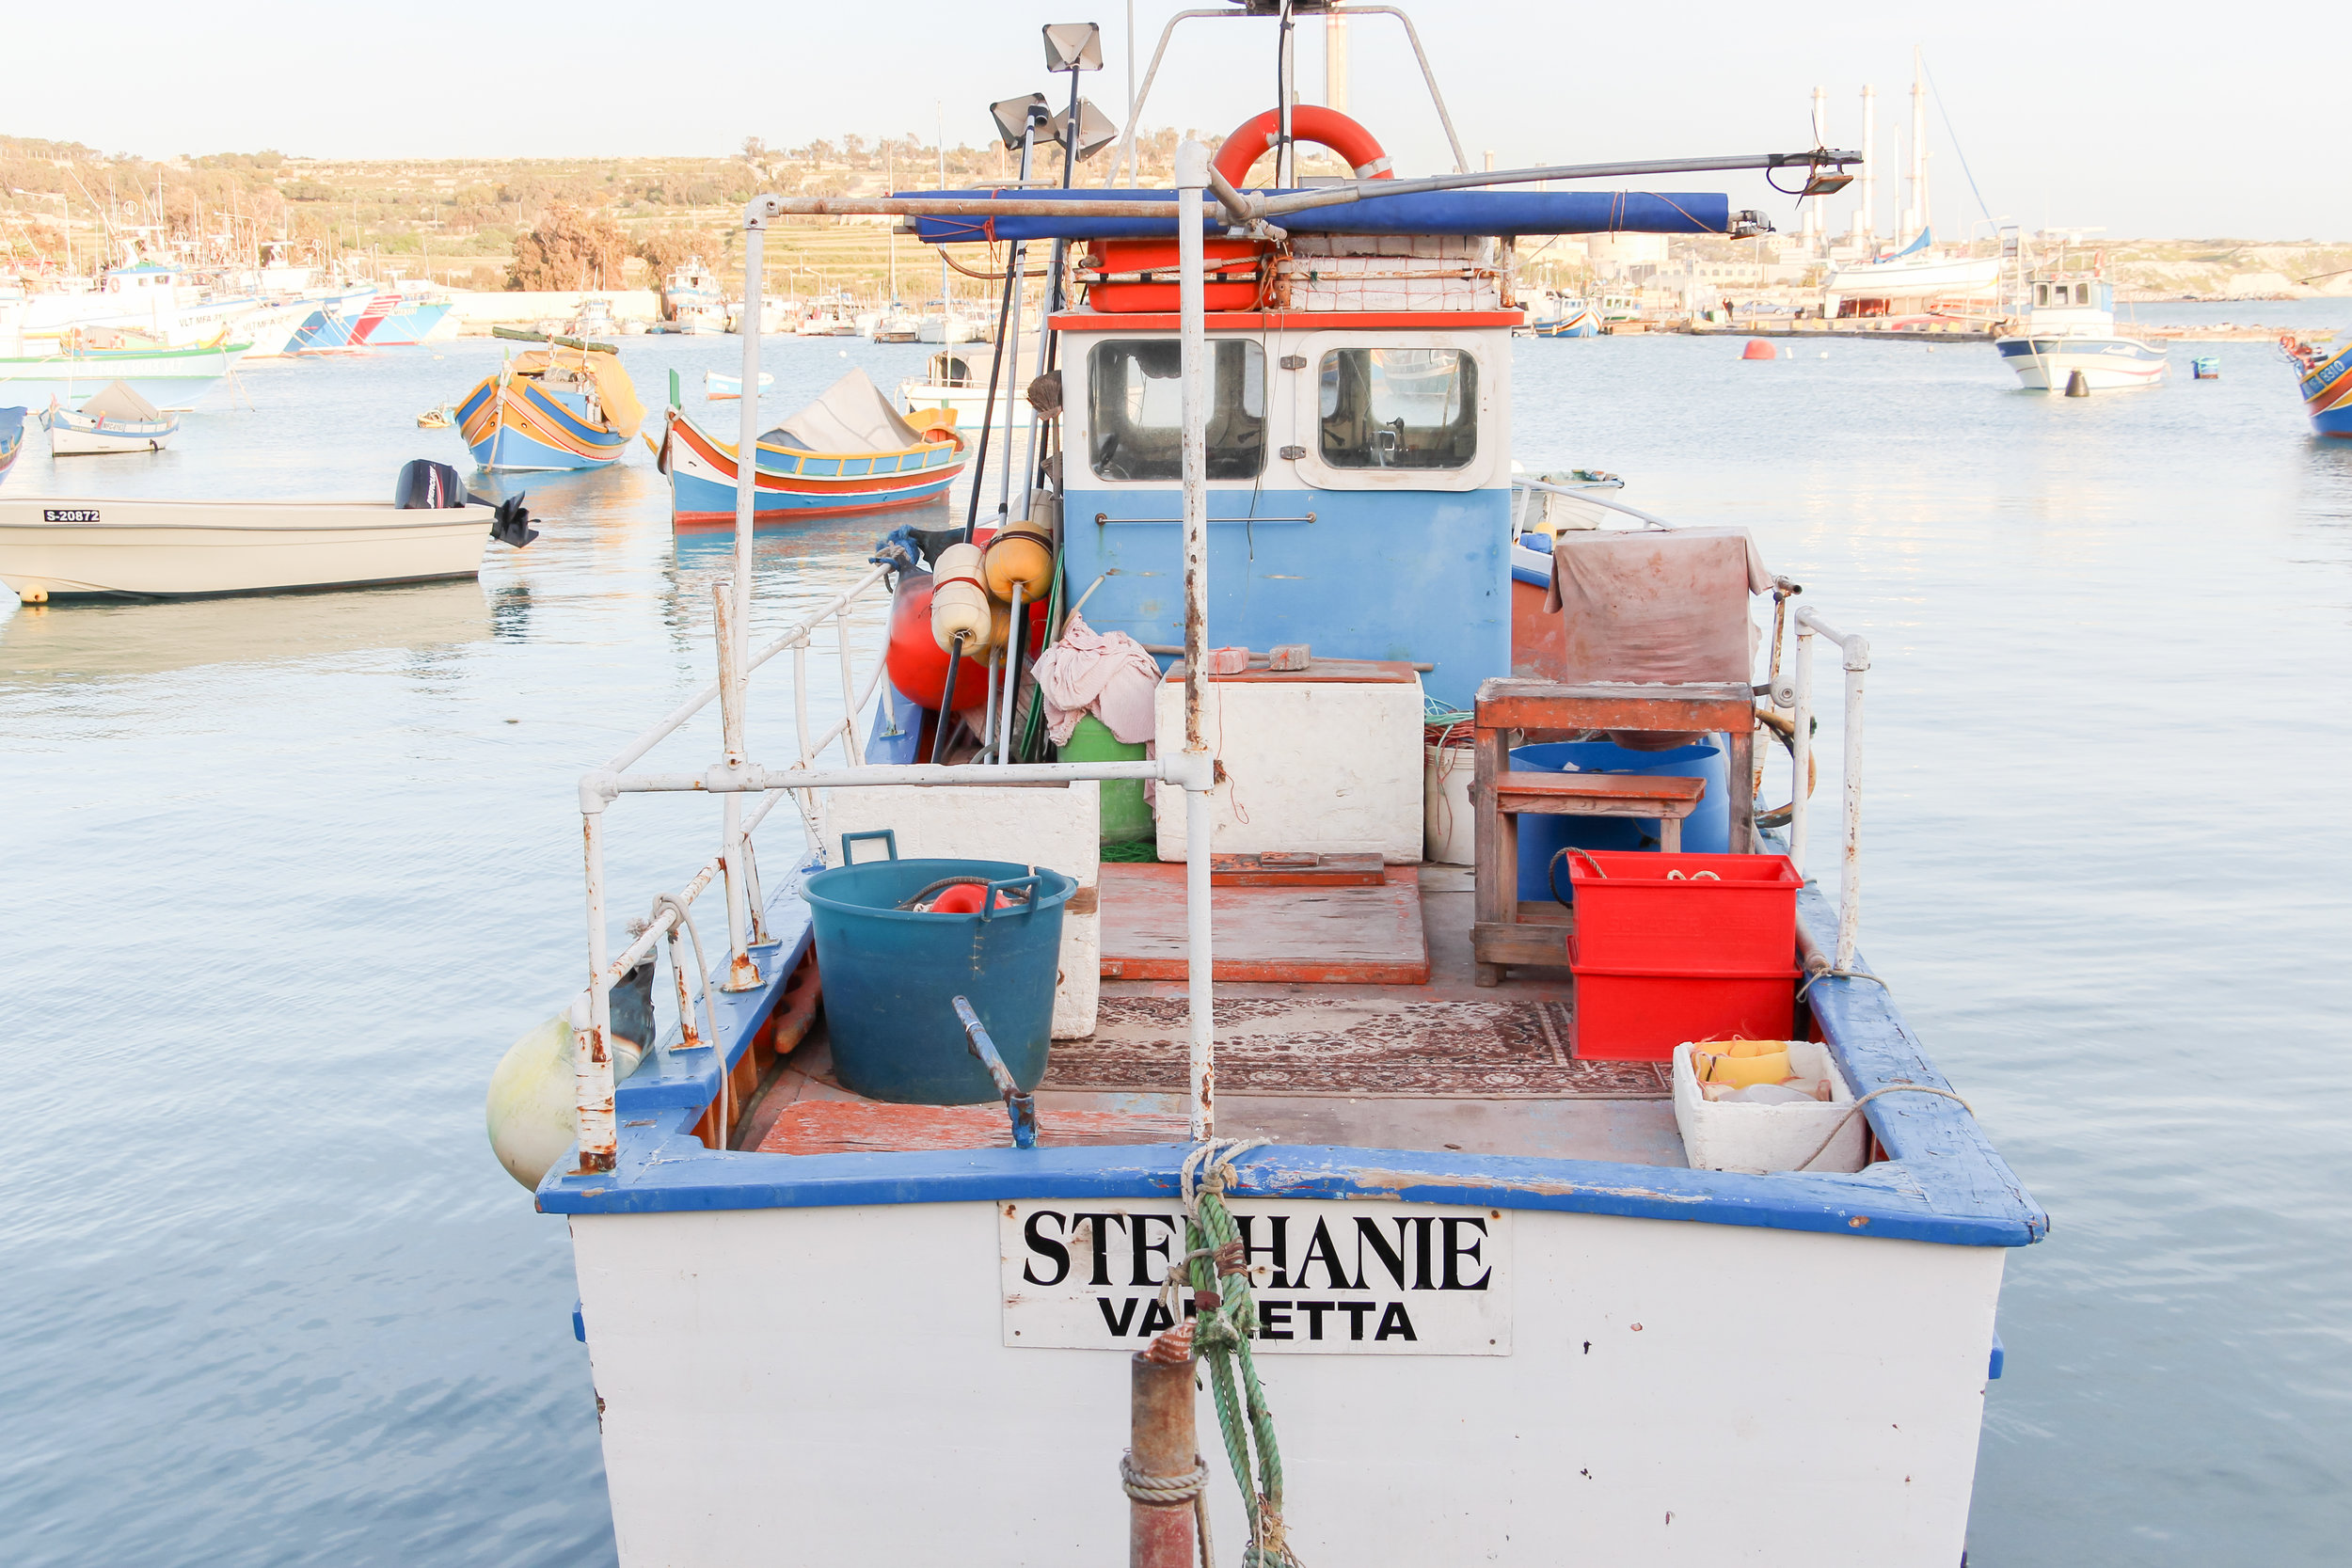 Maltese Boats   Traditional Fishing Village   Mediterranean Sea   Marsaxlokk - Thinking About Appreciation For Quality In Malta   Malta, Europe   DoLessGetMoreDone.com   - Canon Minimal Travel Documentary Photography - search for Liveability   Sustainability